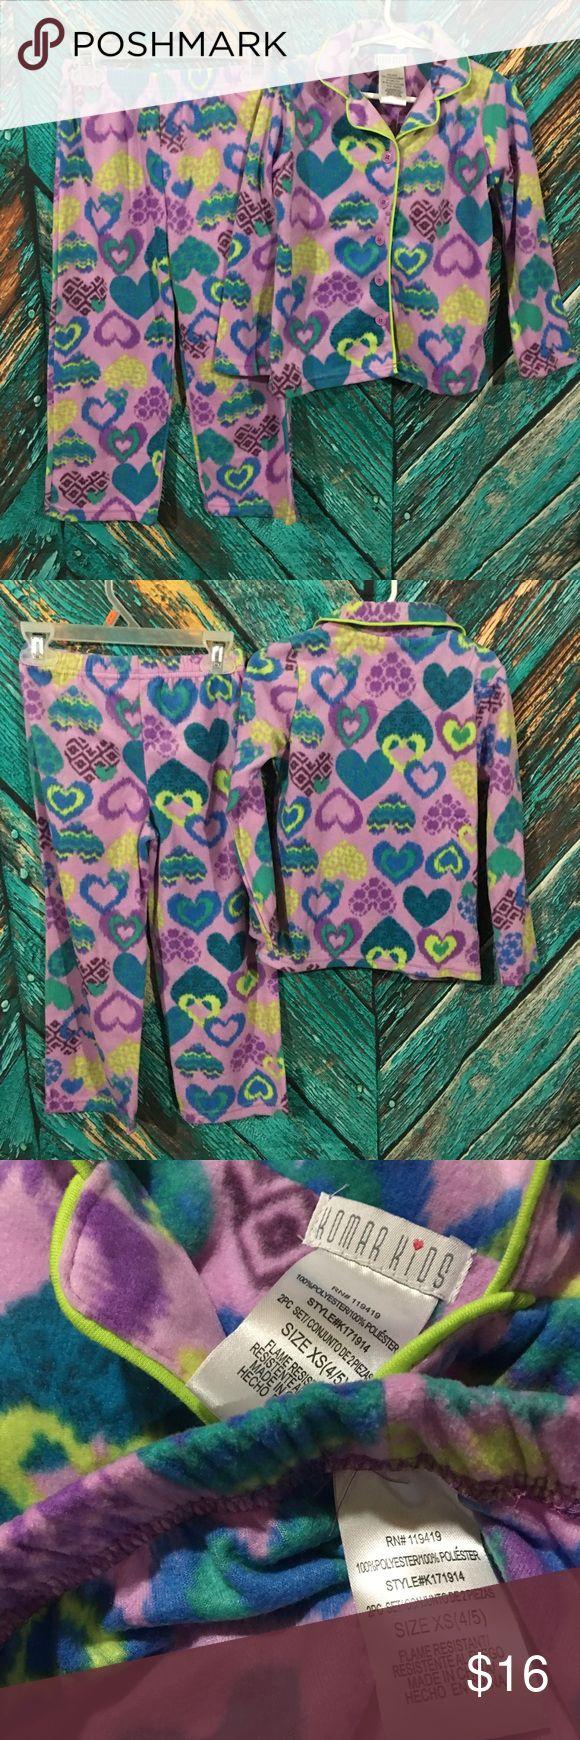 Komar Kids Pajamas Girls XS 4/5 New Komar Kids Pajamas  Girls XS 4/5  New with tags  Long sleeve Button Front Top and long bottoms  100% polyester fleece flame retardant material  Purple with hearts and geometric design Pajamas Pajama Sets